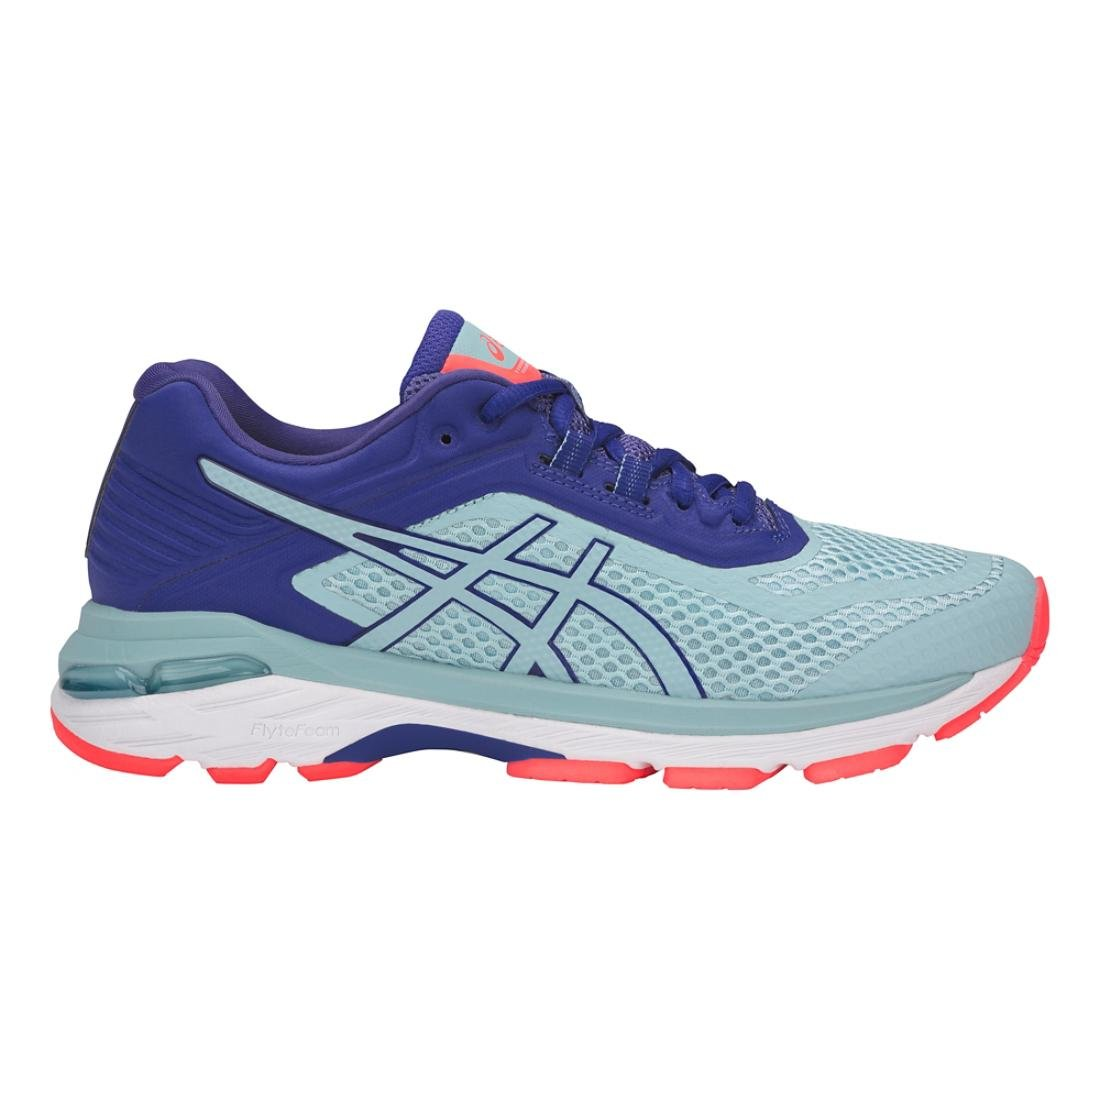 ASICS B(M) Women's GT-2000 6 Running Shoe B071P9KQ25 6 B(M) ASICS US|Porcelain Blue/Porcelain Blue/Asics Blue 64fa3d